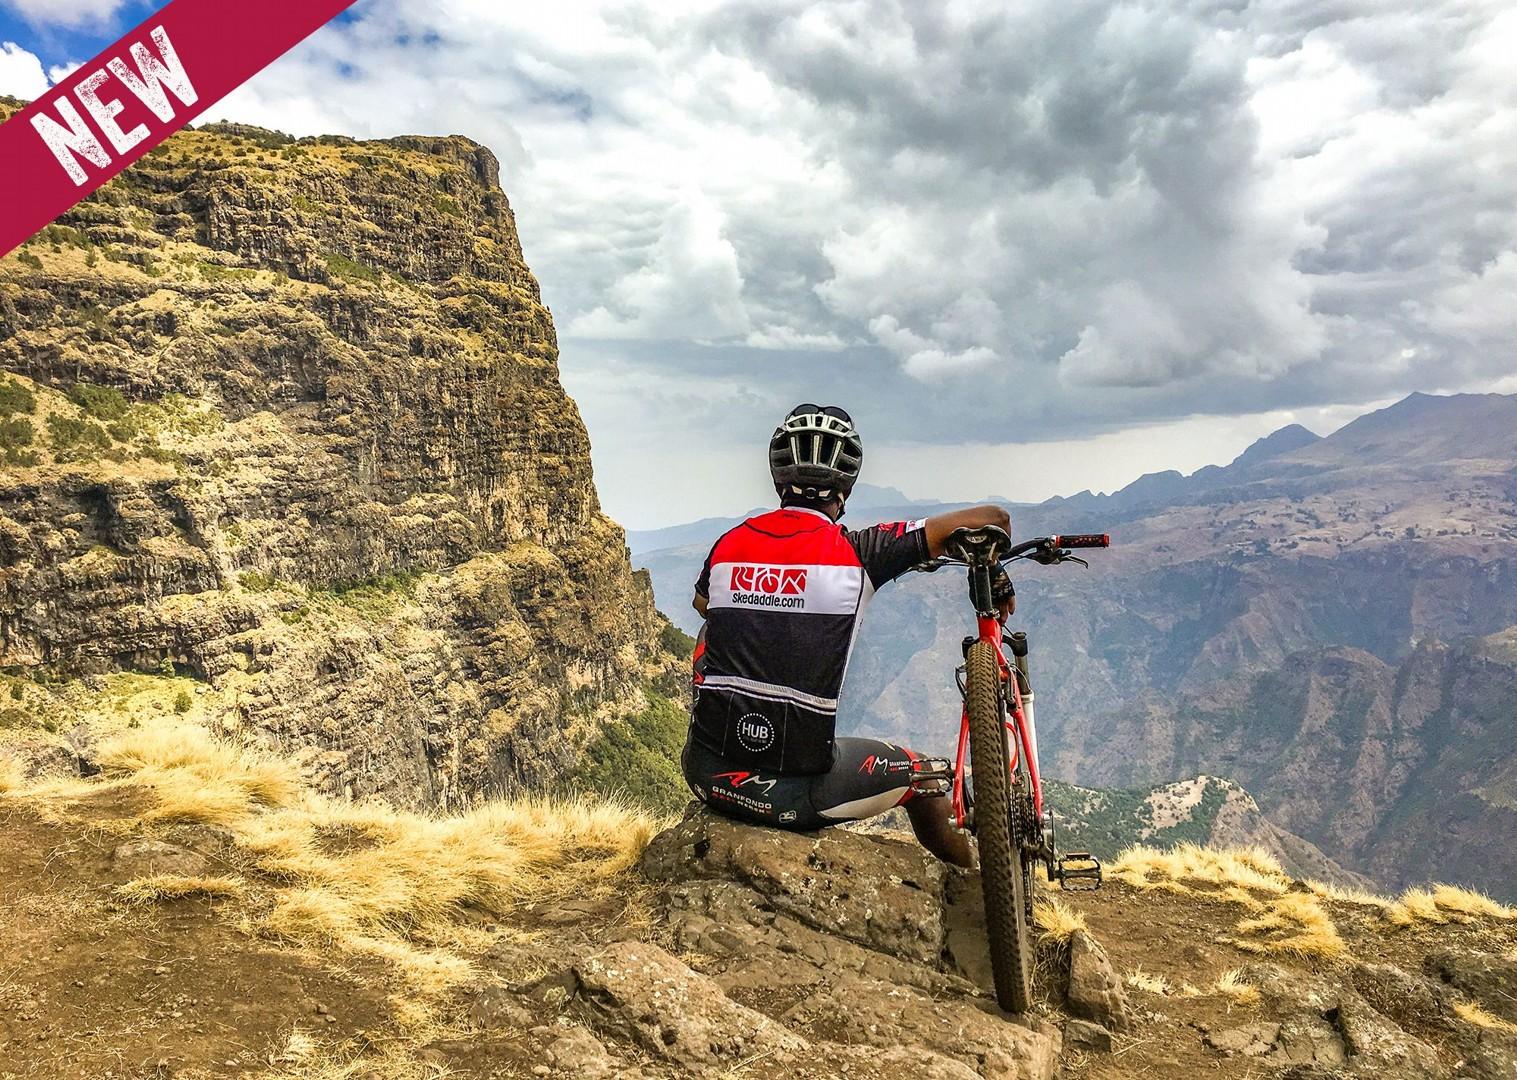 eth.jpg - NEW! Ethiopia - Enchanting Ethiopia - Cycling Adventures